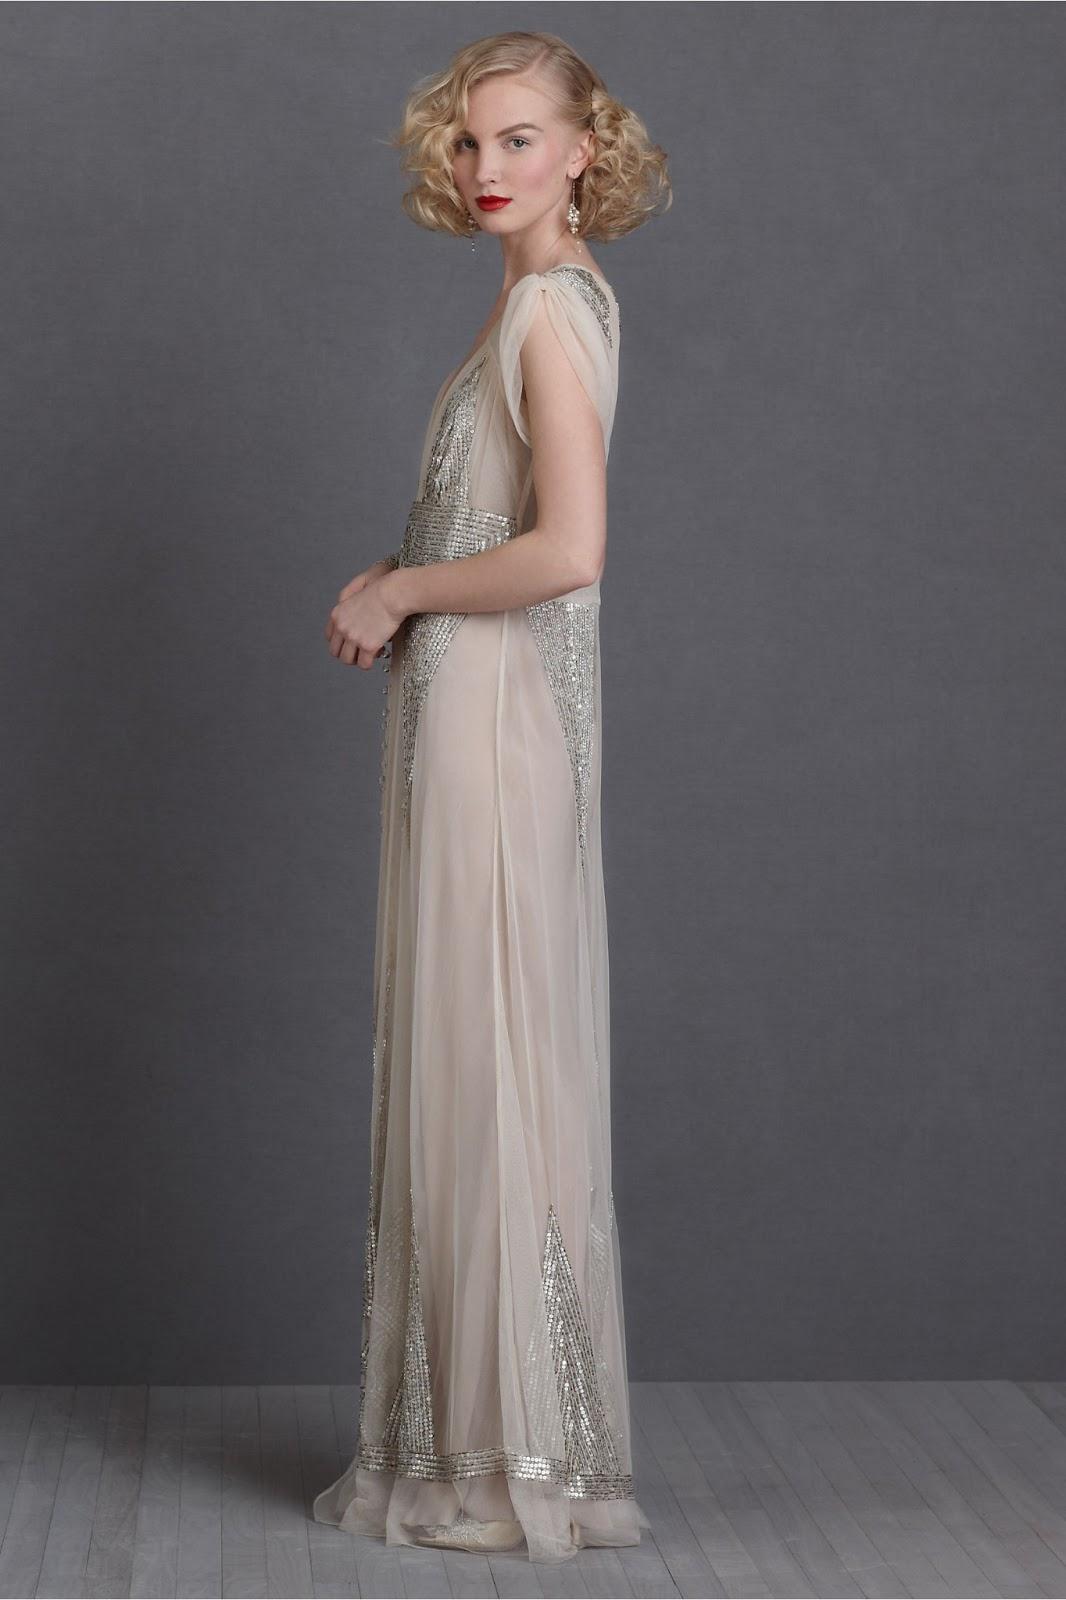 Robes de soiree style annees 20